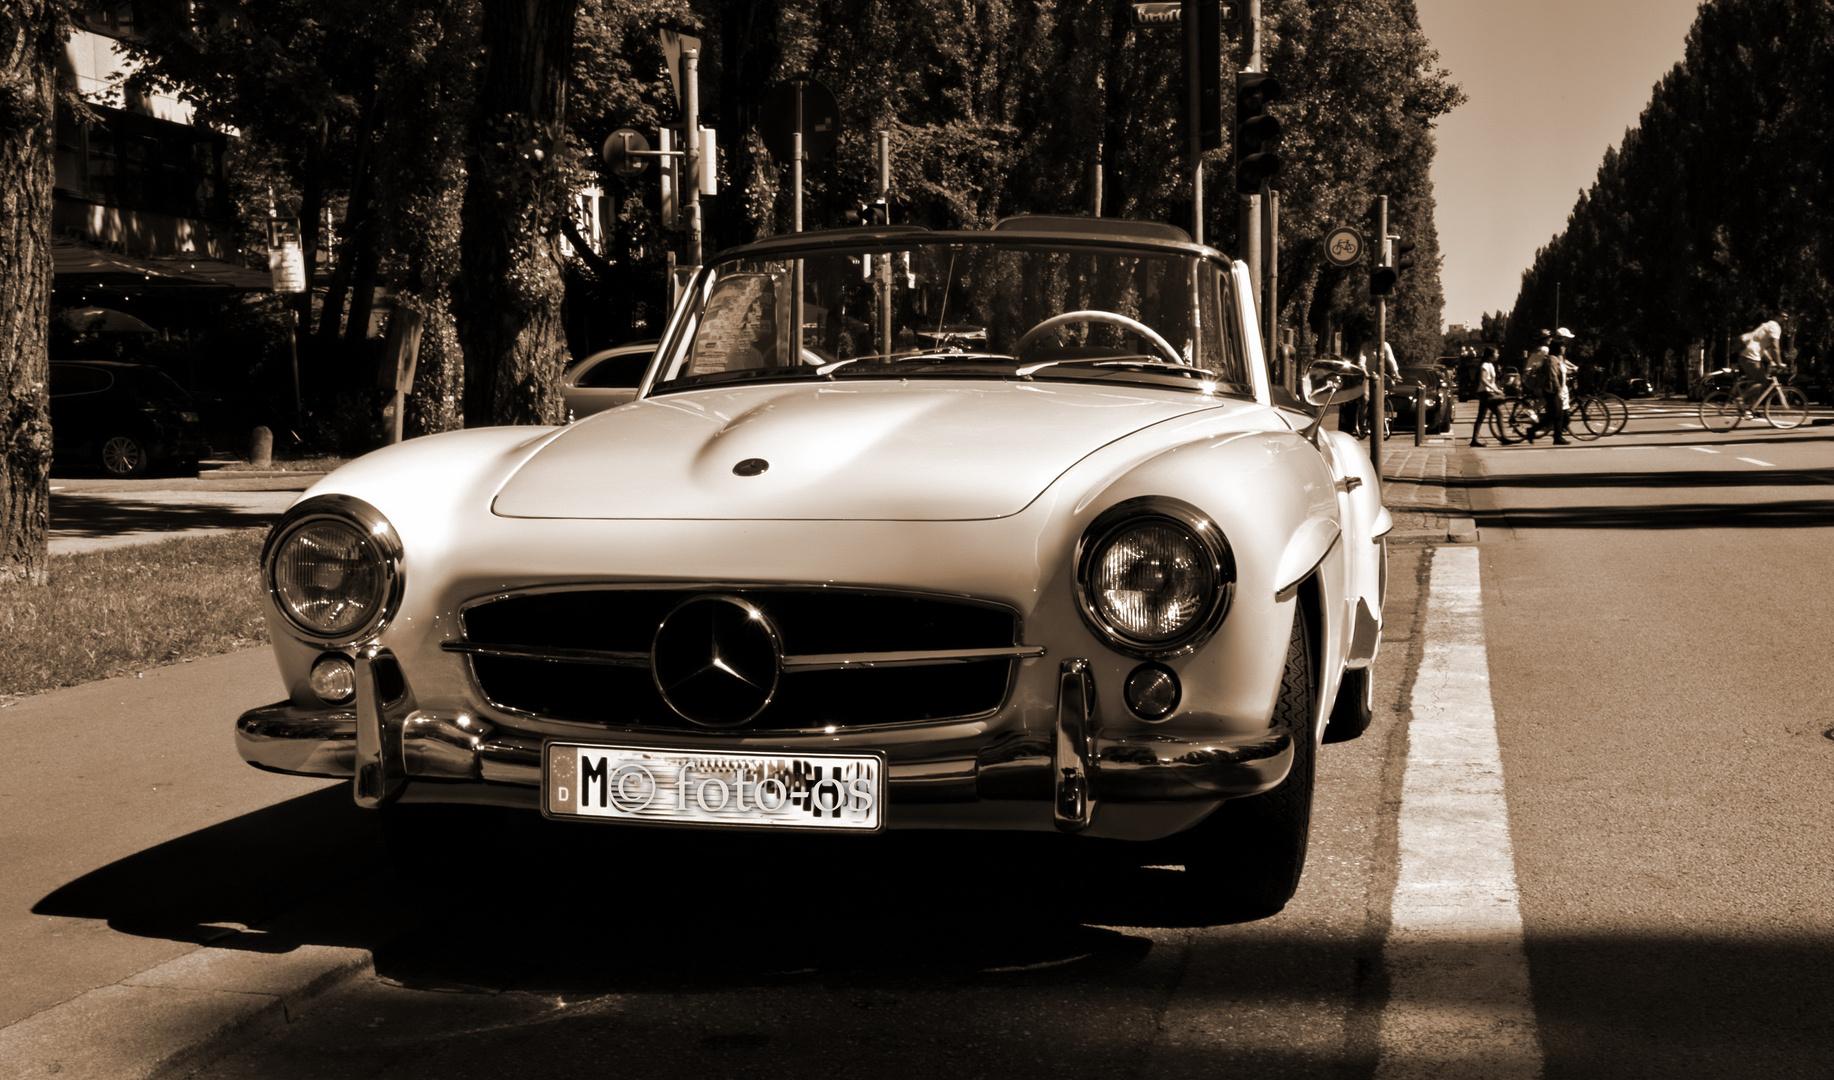 Oldtimer (Mercedes 300 SL) in München